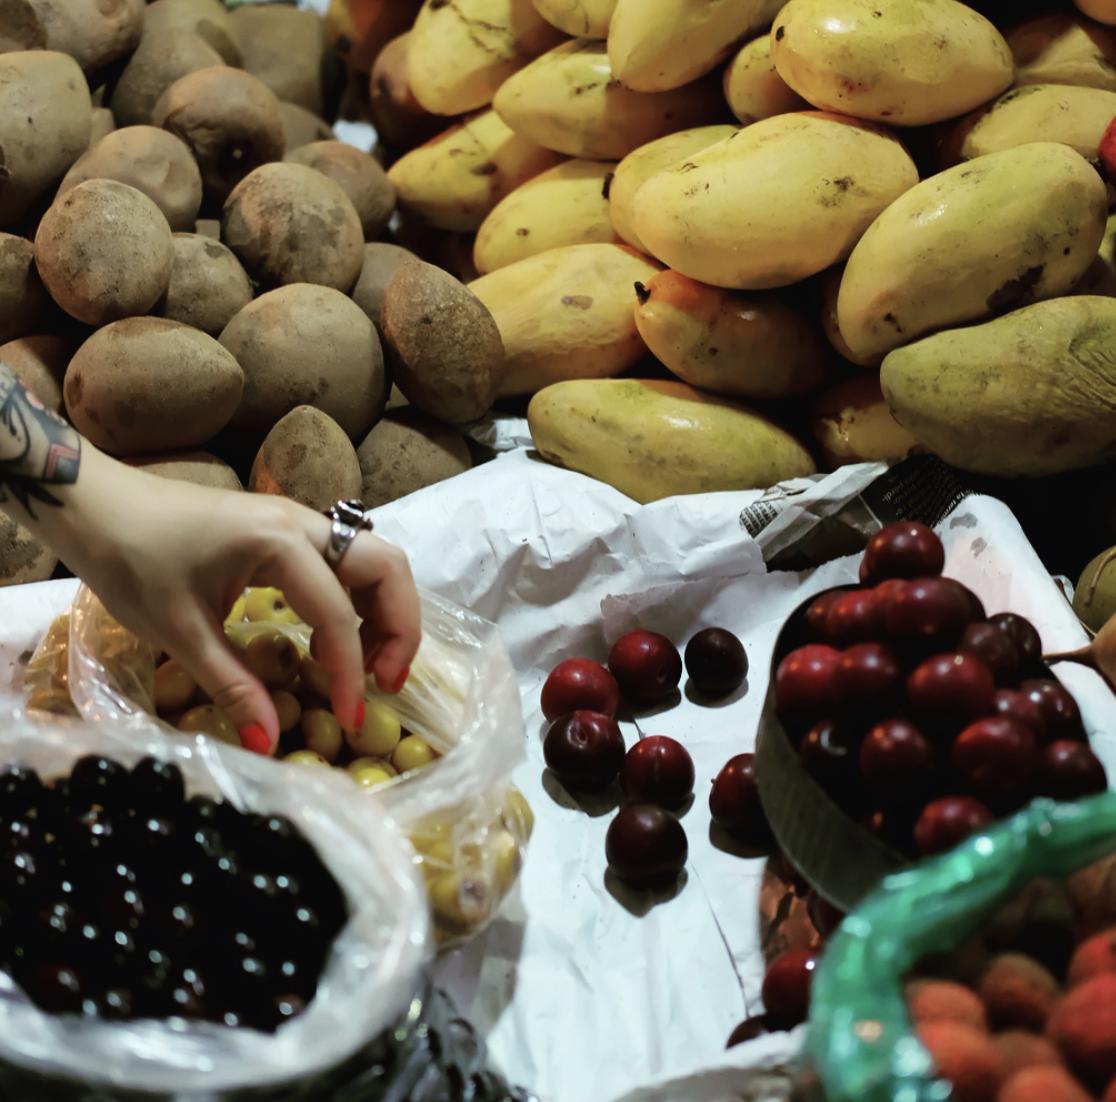 mexico city fruits